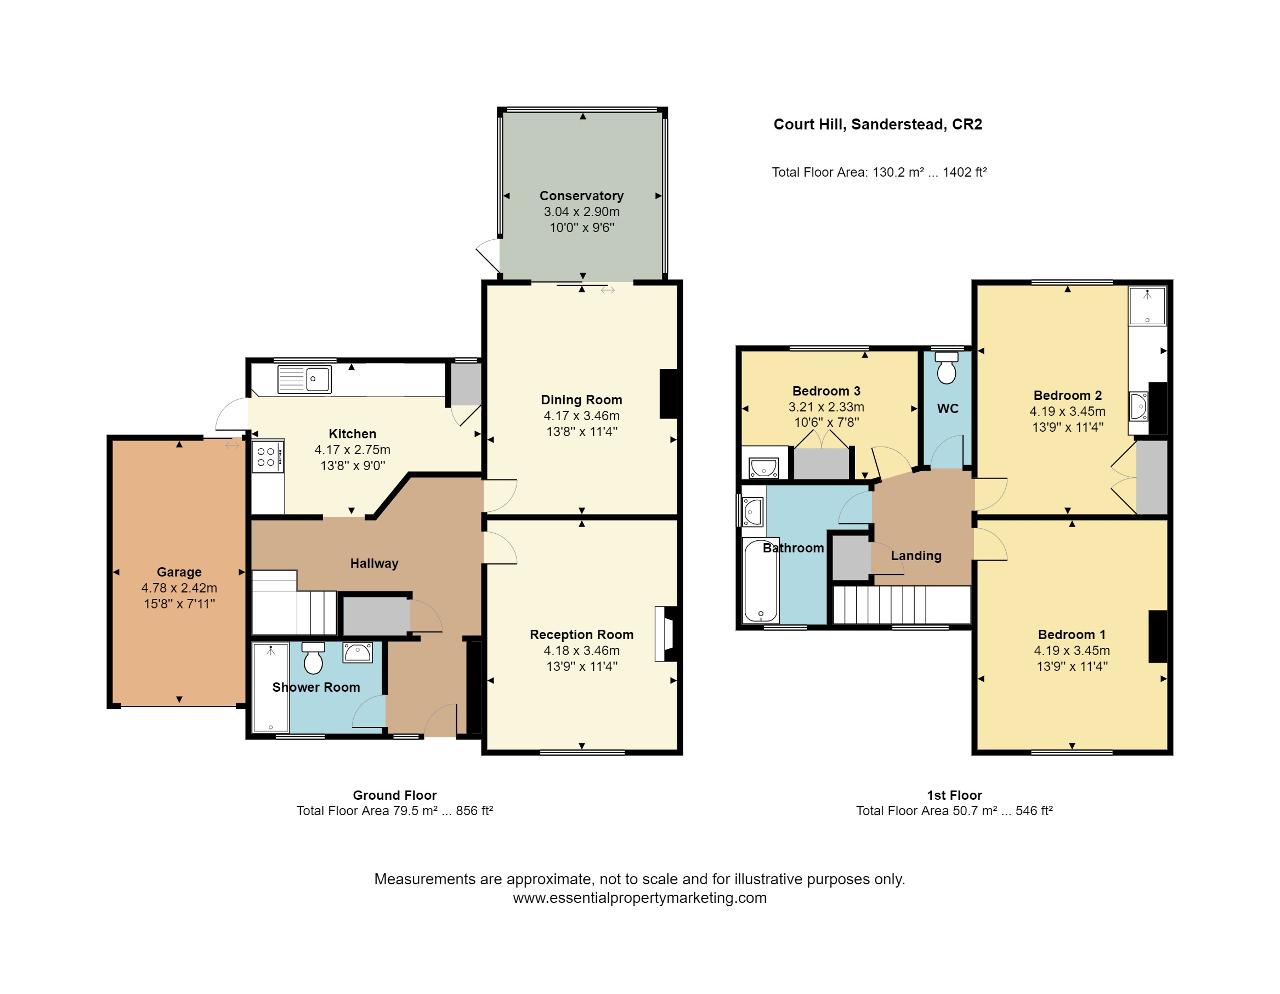 Floorplan of Court Hill, Sanderstead, South Croydon, CR2 9ND